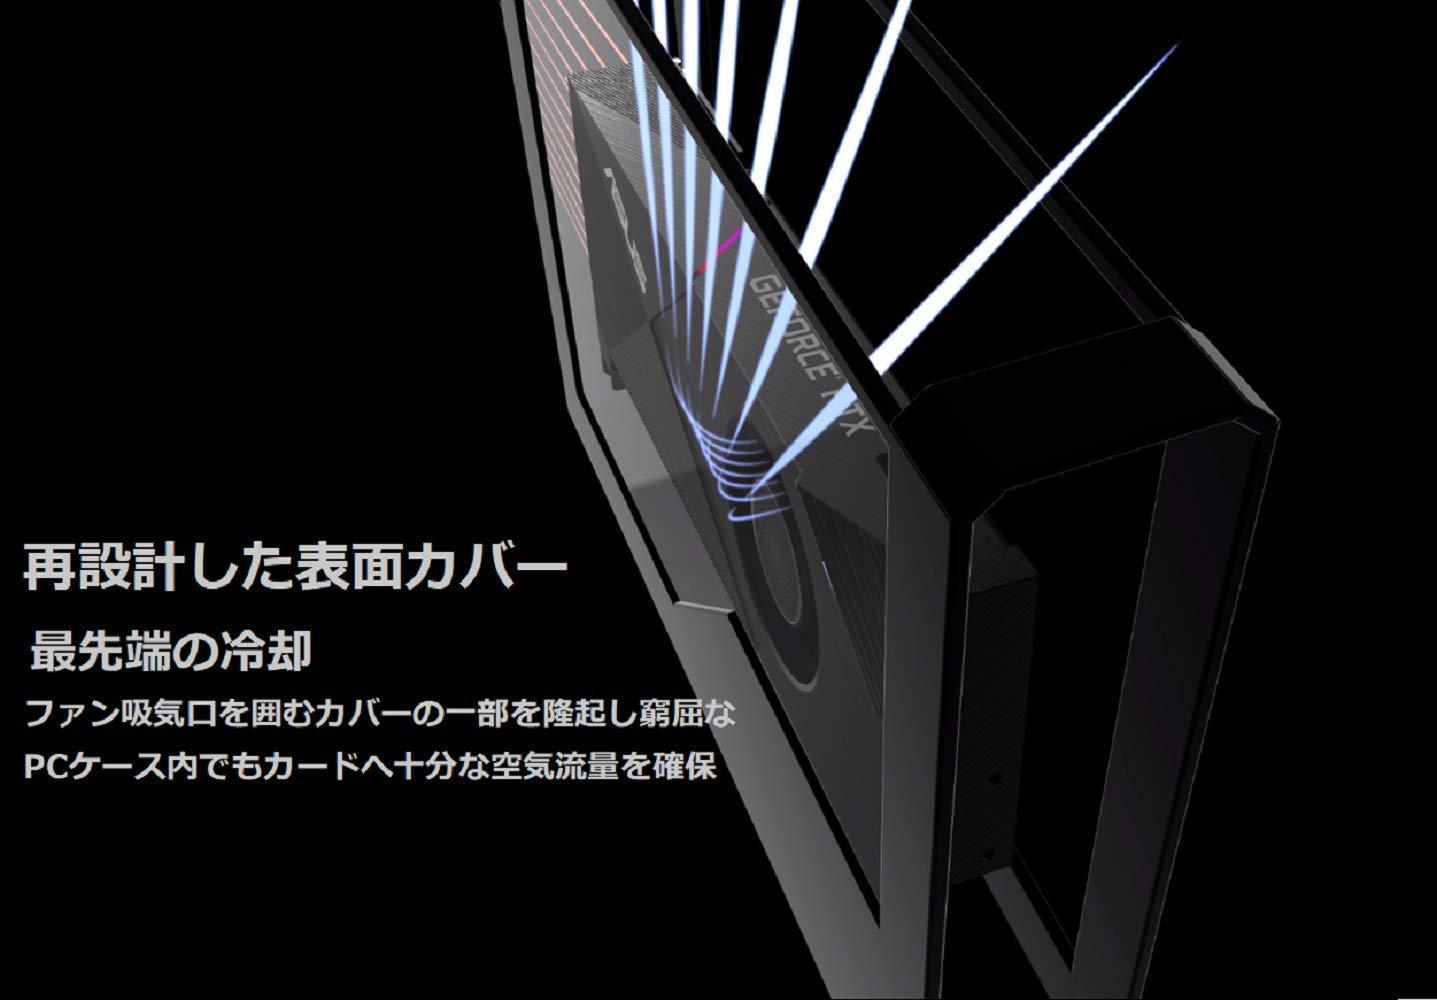 ASUS GeForce RTX 2070 8G EVO Turbo Edition GDDR6 HDMI DP 1.4 Graphics Card (TURBO-RTX2070-8G-EVO) by ASUS (Image #5)